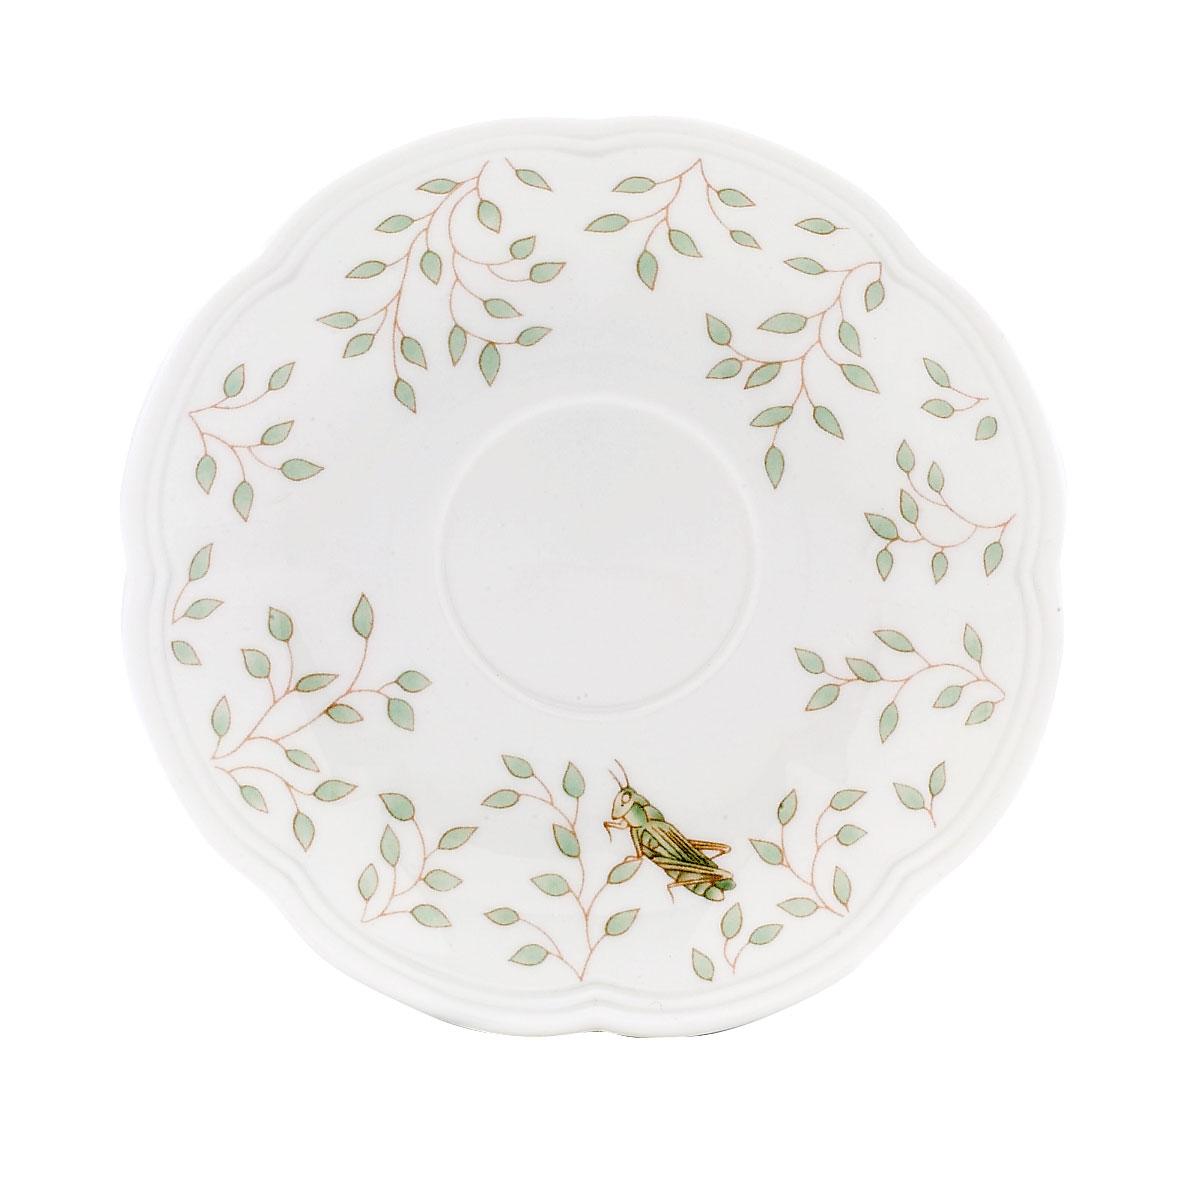 Lenox Butterfly Meadow Dinnerware Saucer